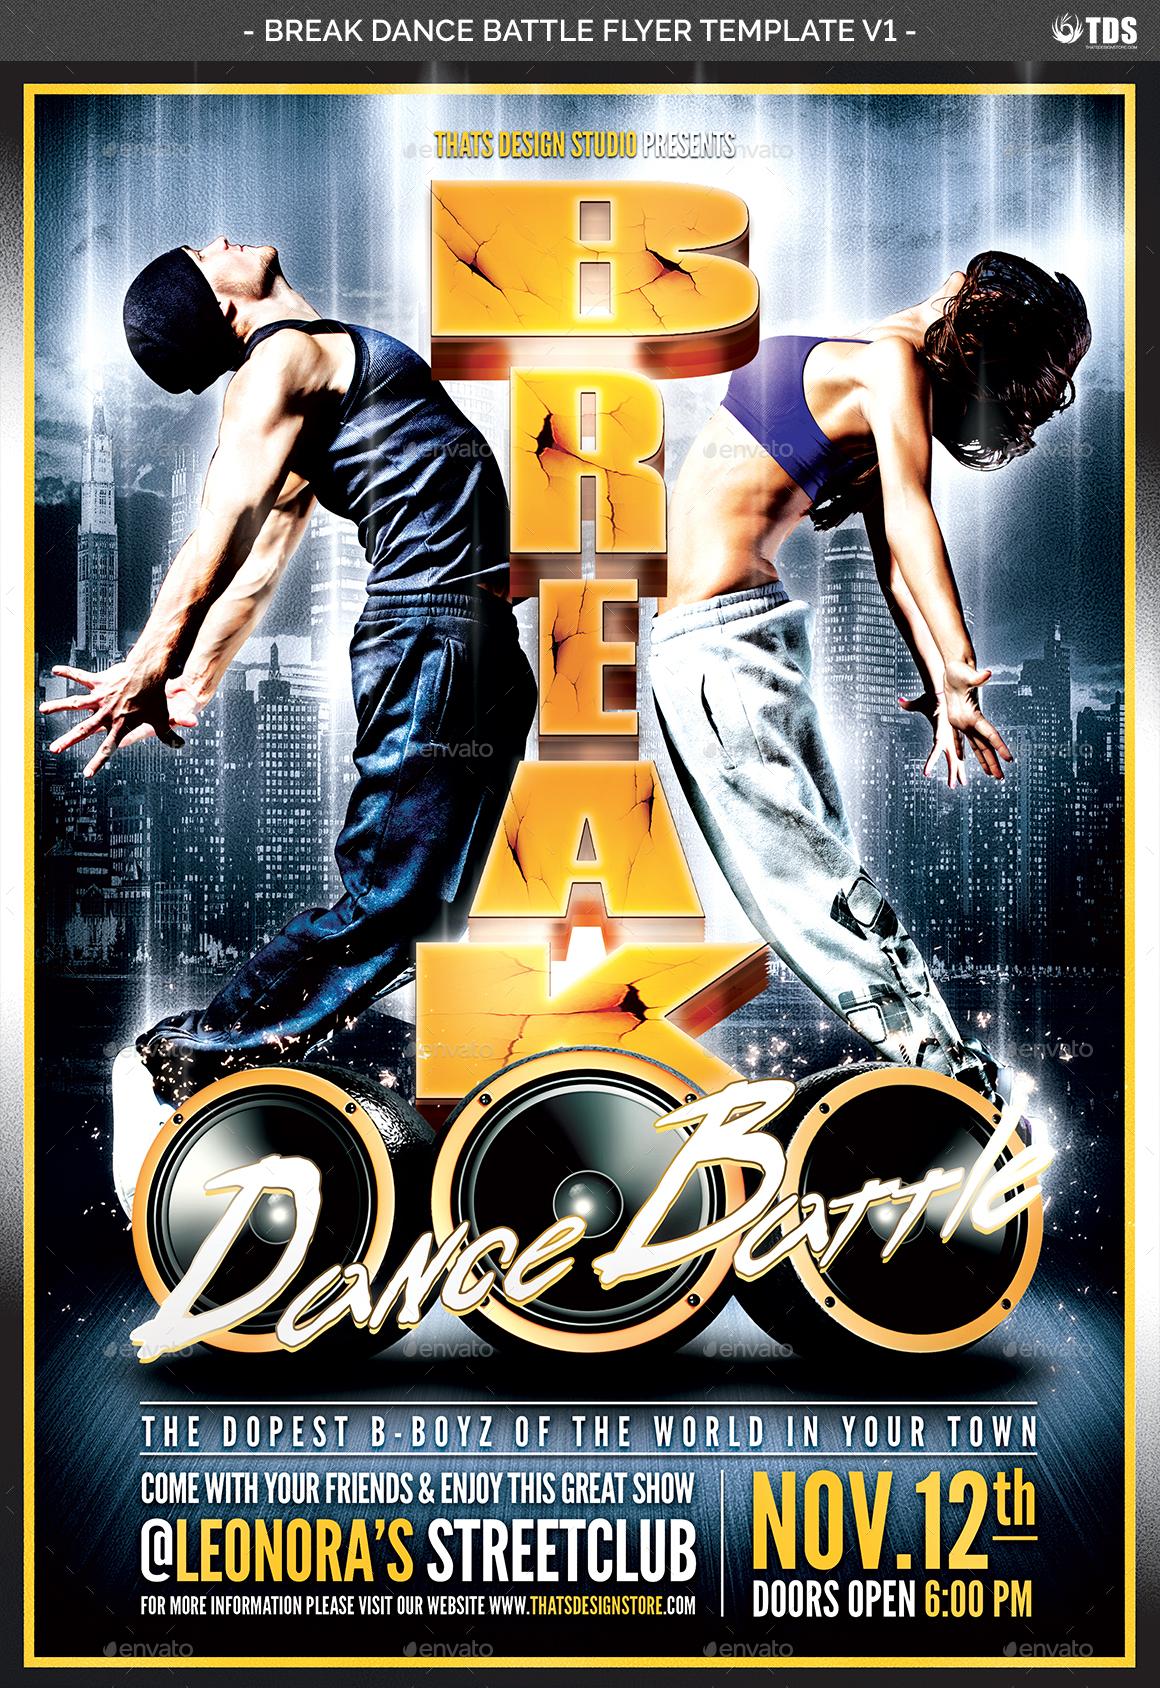 Break Dance Battle Flyer Template V1 by lou606 | GraphicRiver